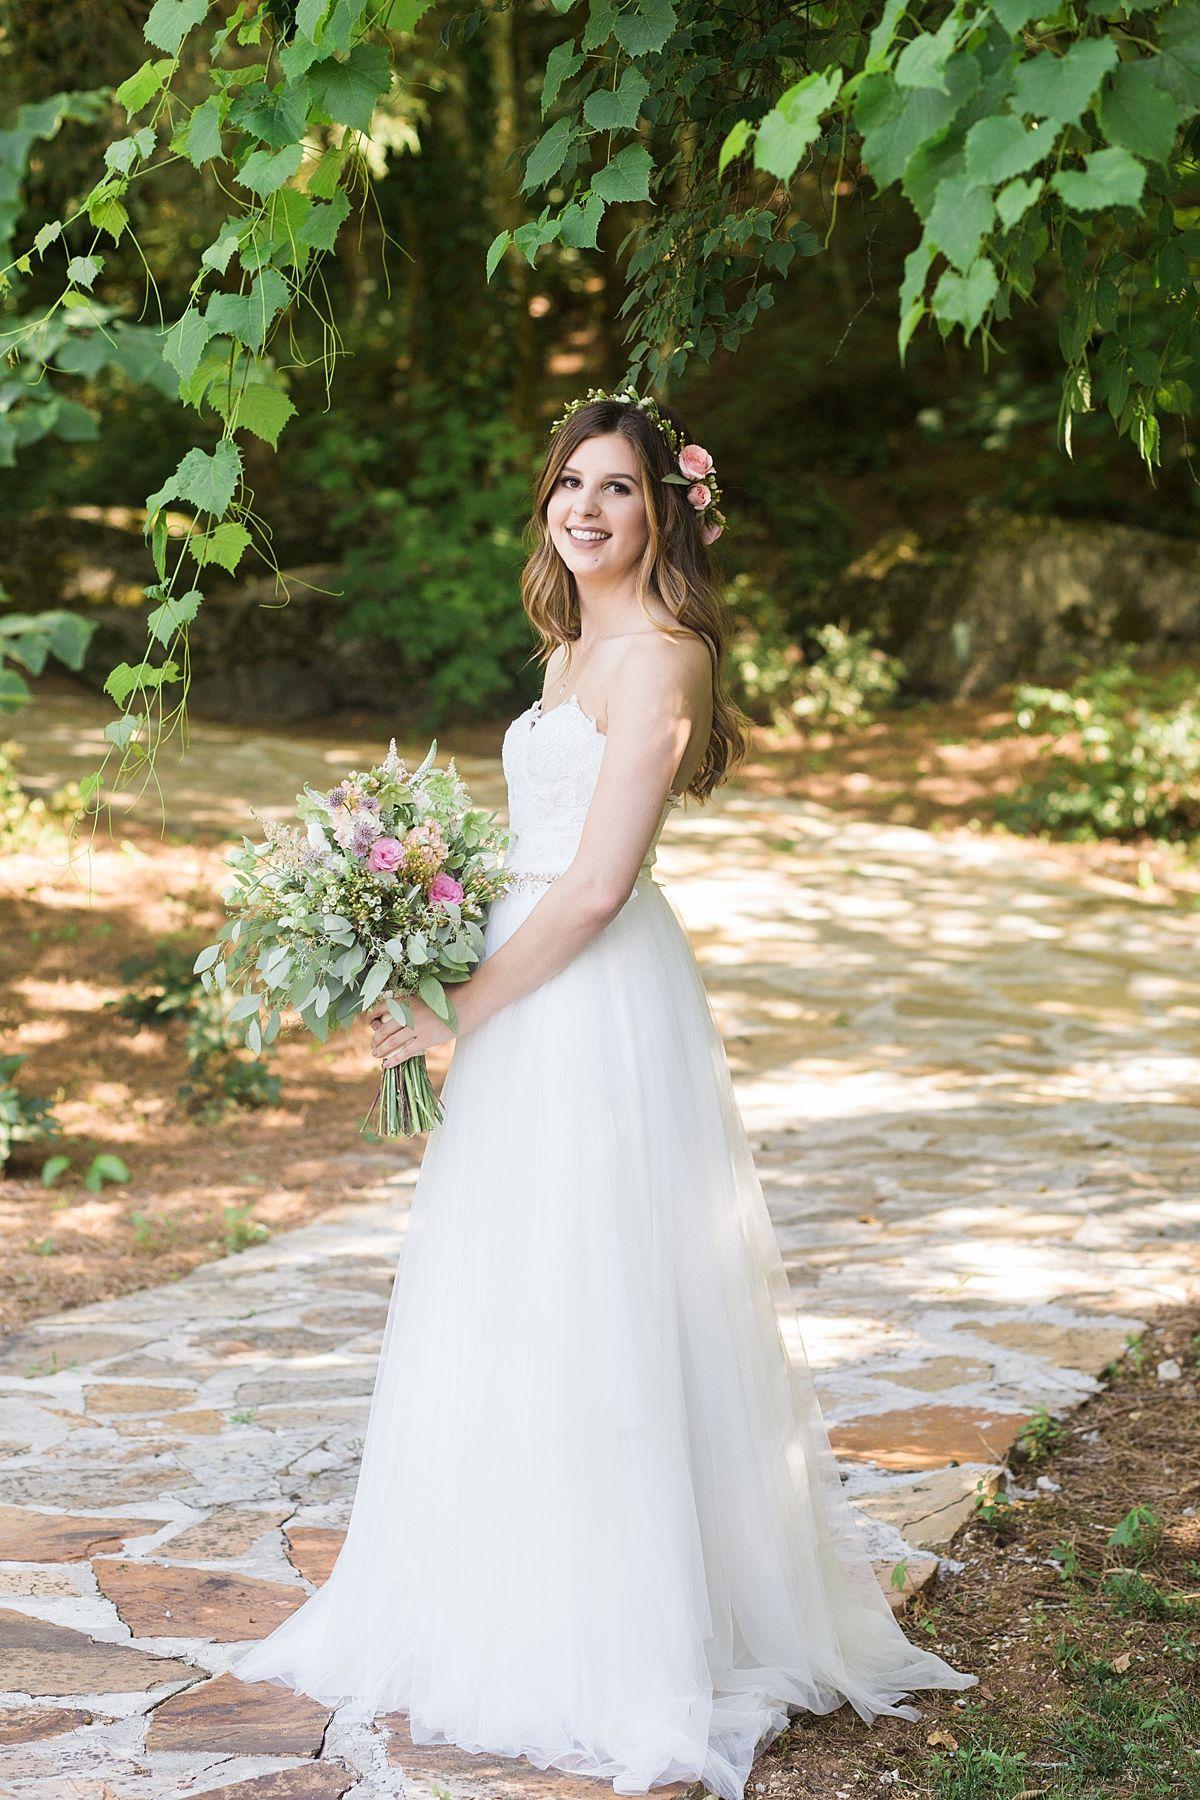 A Summer Garden Wedding In Knoxville Summer Garden Wedding Southern Wedding Inspiration Garden Wedding